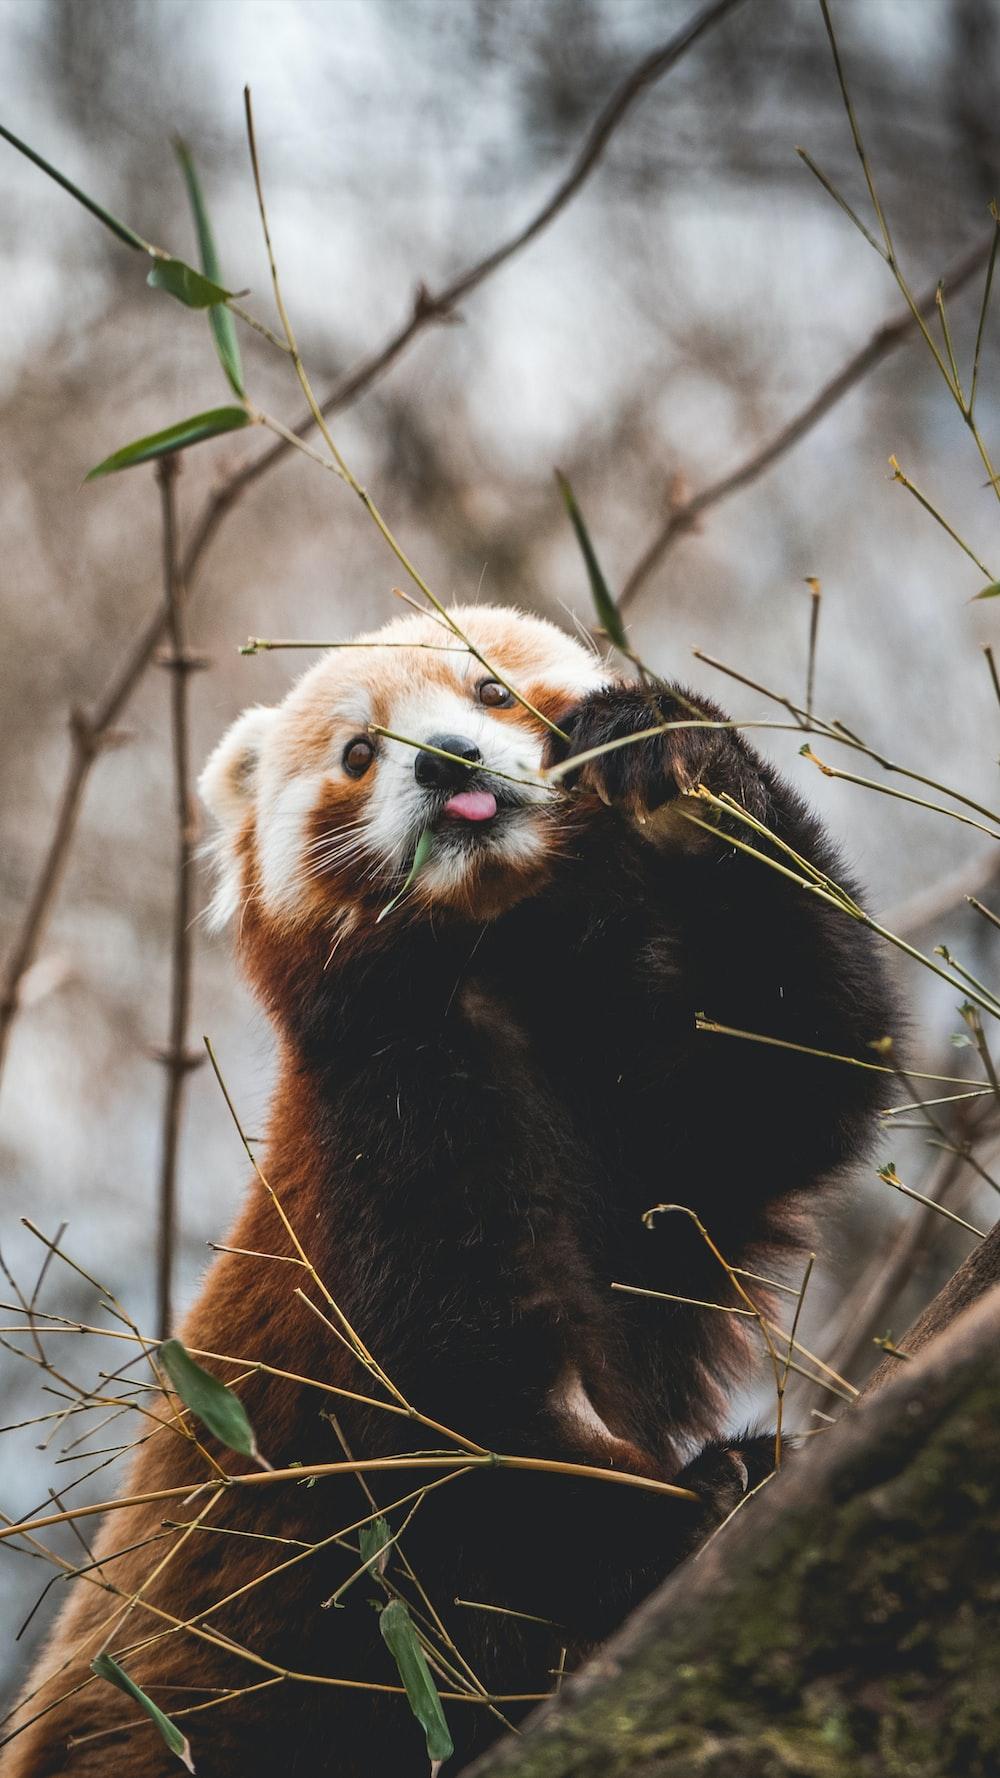 red panda close-up photography